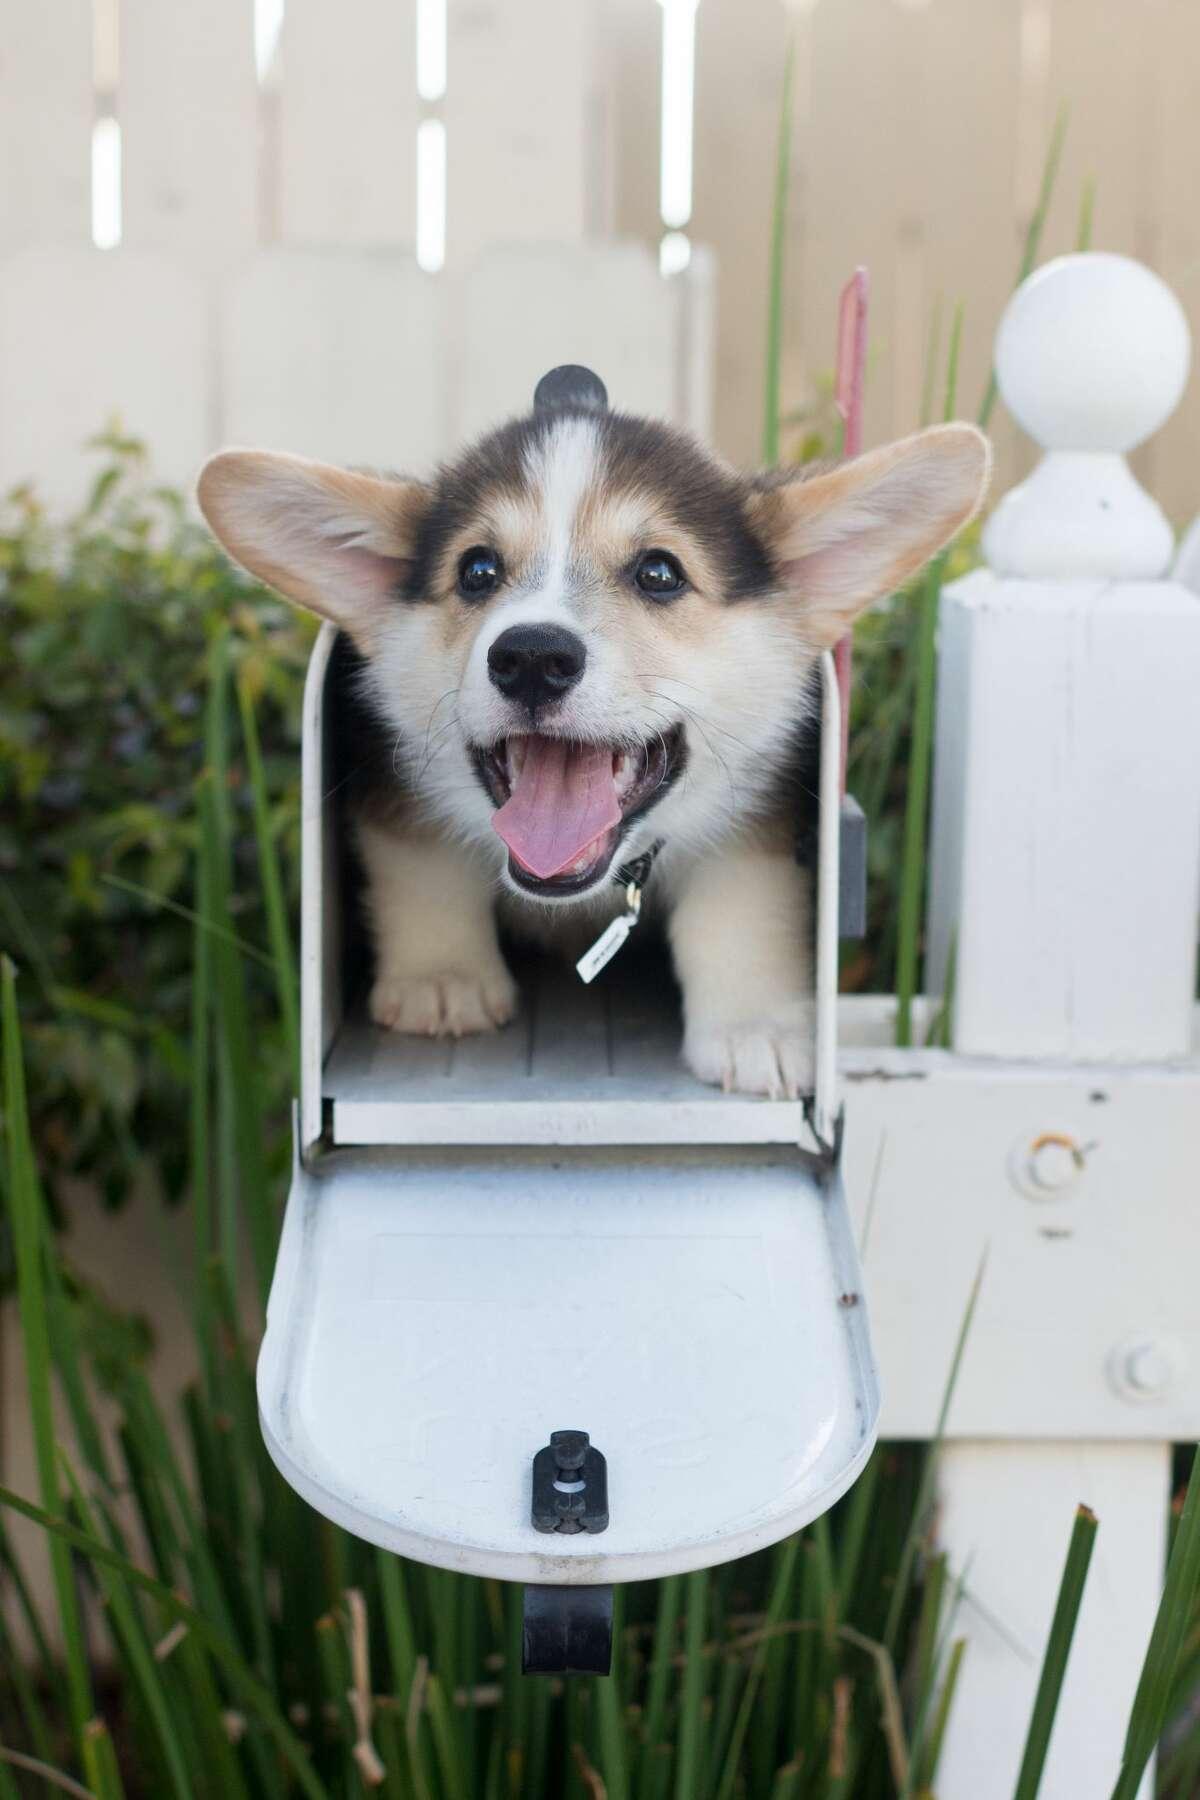 Cute Tricolor Pembroke Welsh Corgi dog smiling inside a mailbox.